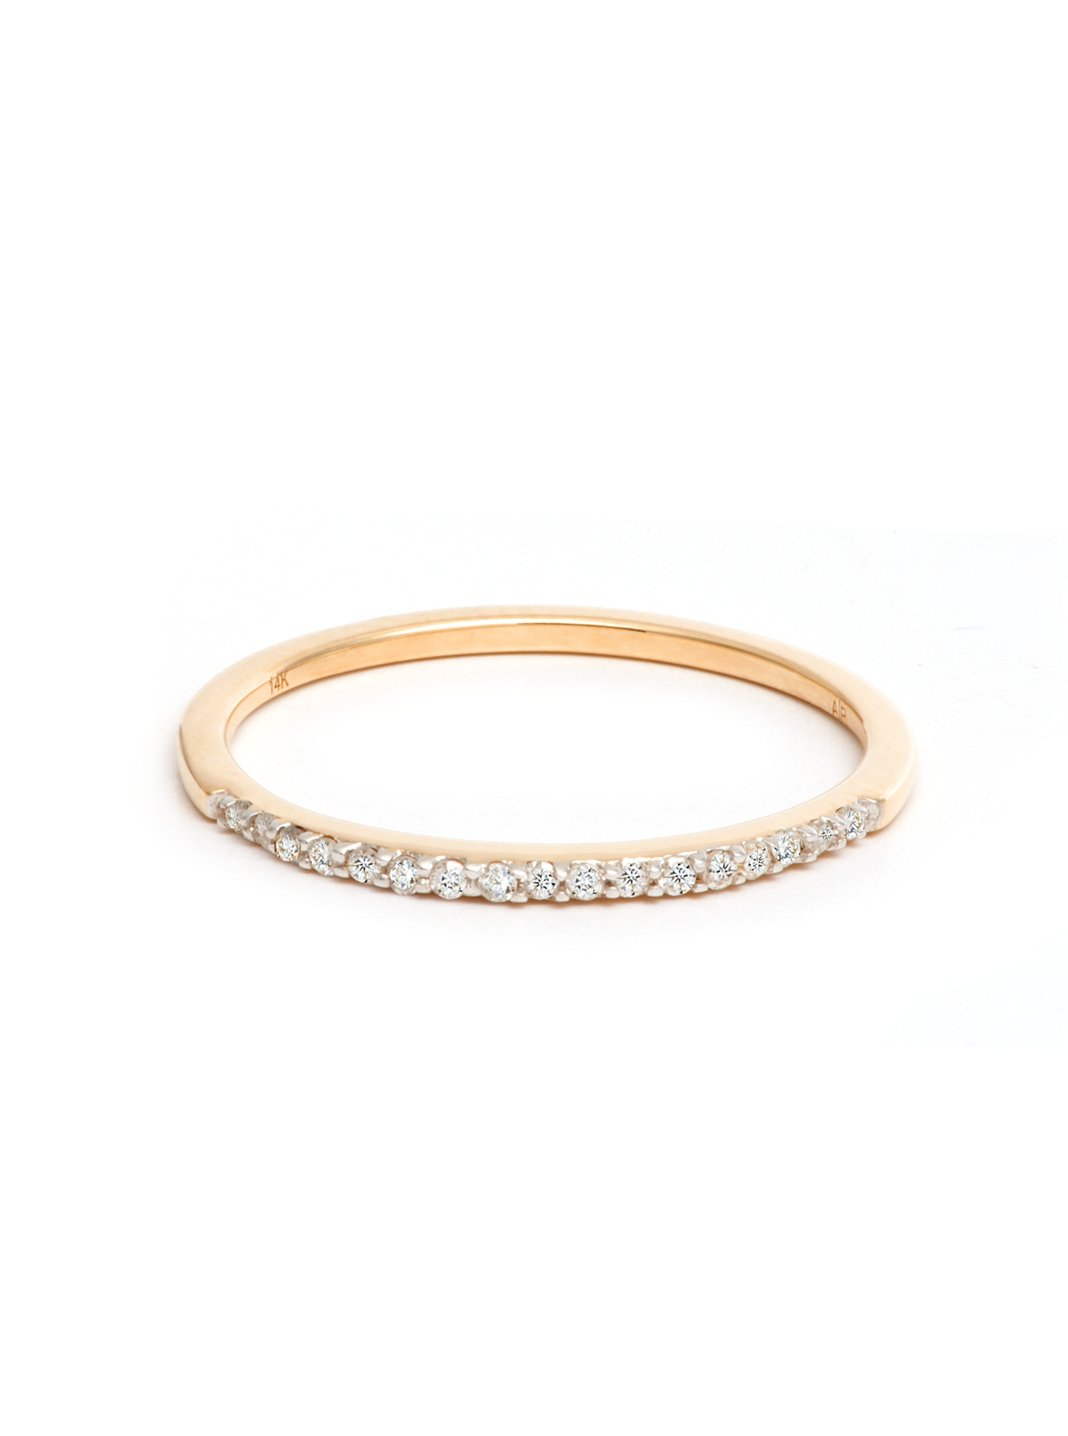 Adina Reyter Y Gold Pave Ring